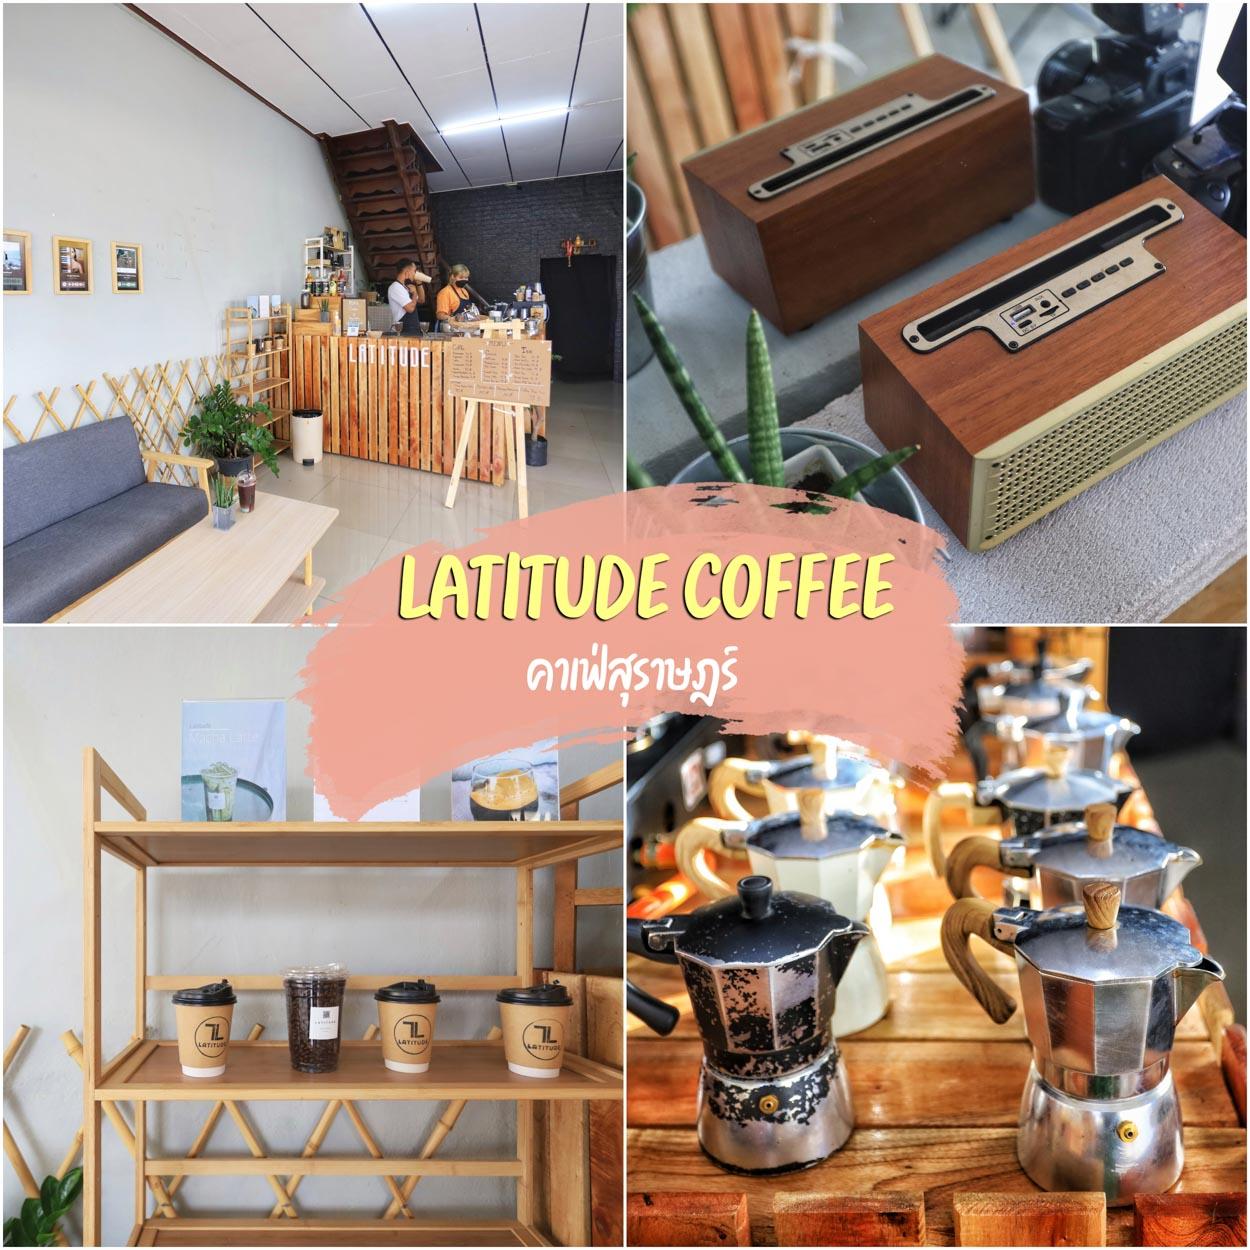 Latitude coffee  คาเฟ่สุราษฎร์ Coffee สโลบาร์ สุดปัง มีกาแฟให้เลือกทานหลายแบบ